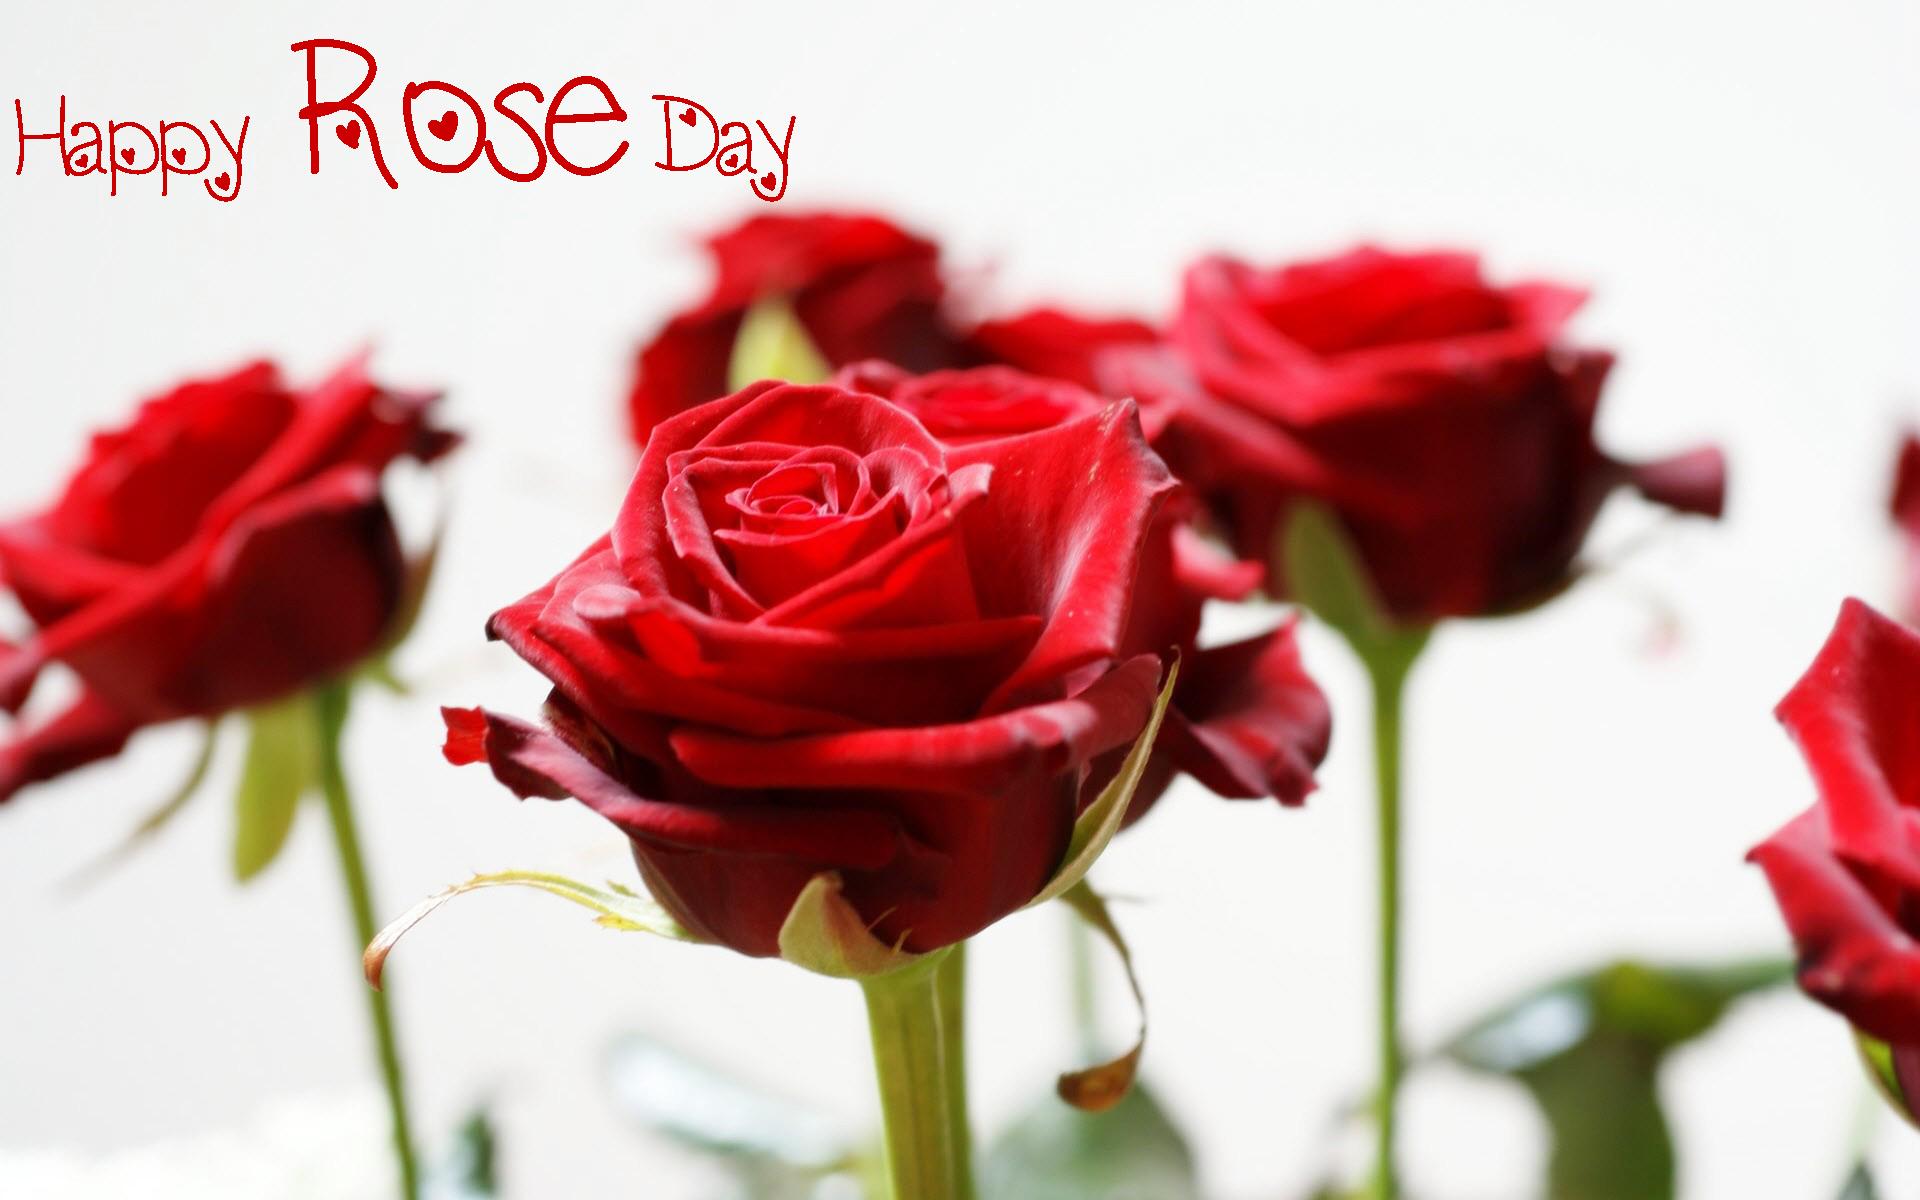 Happy-Rose-Day 2016